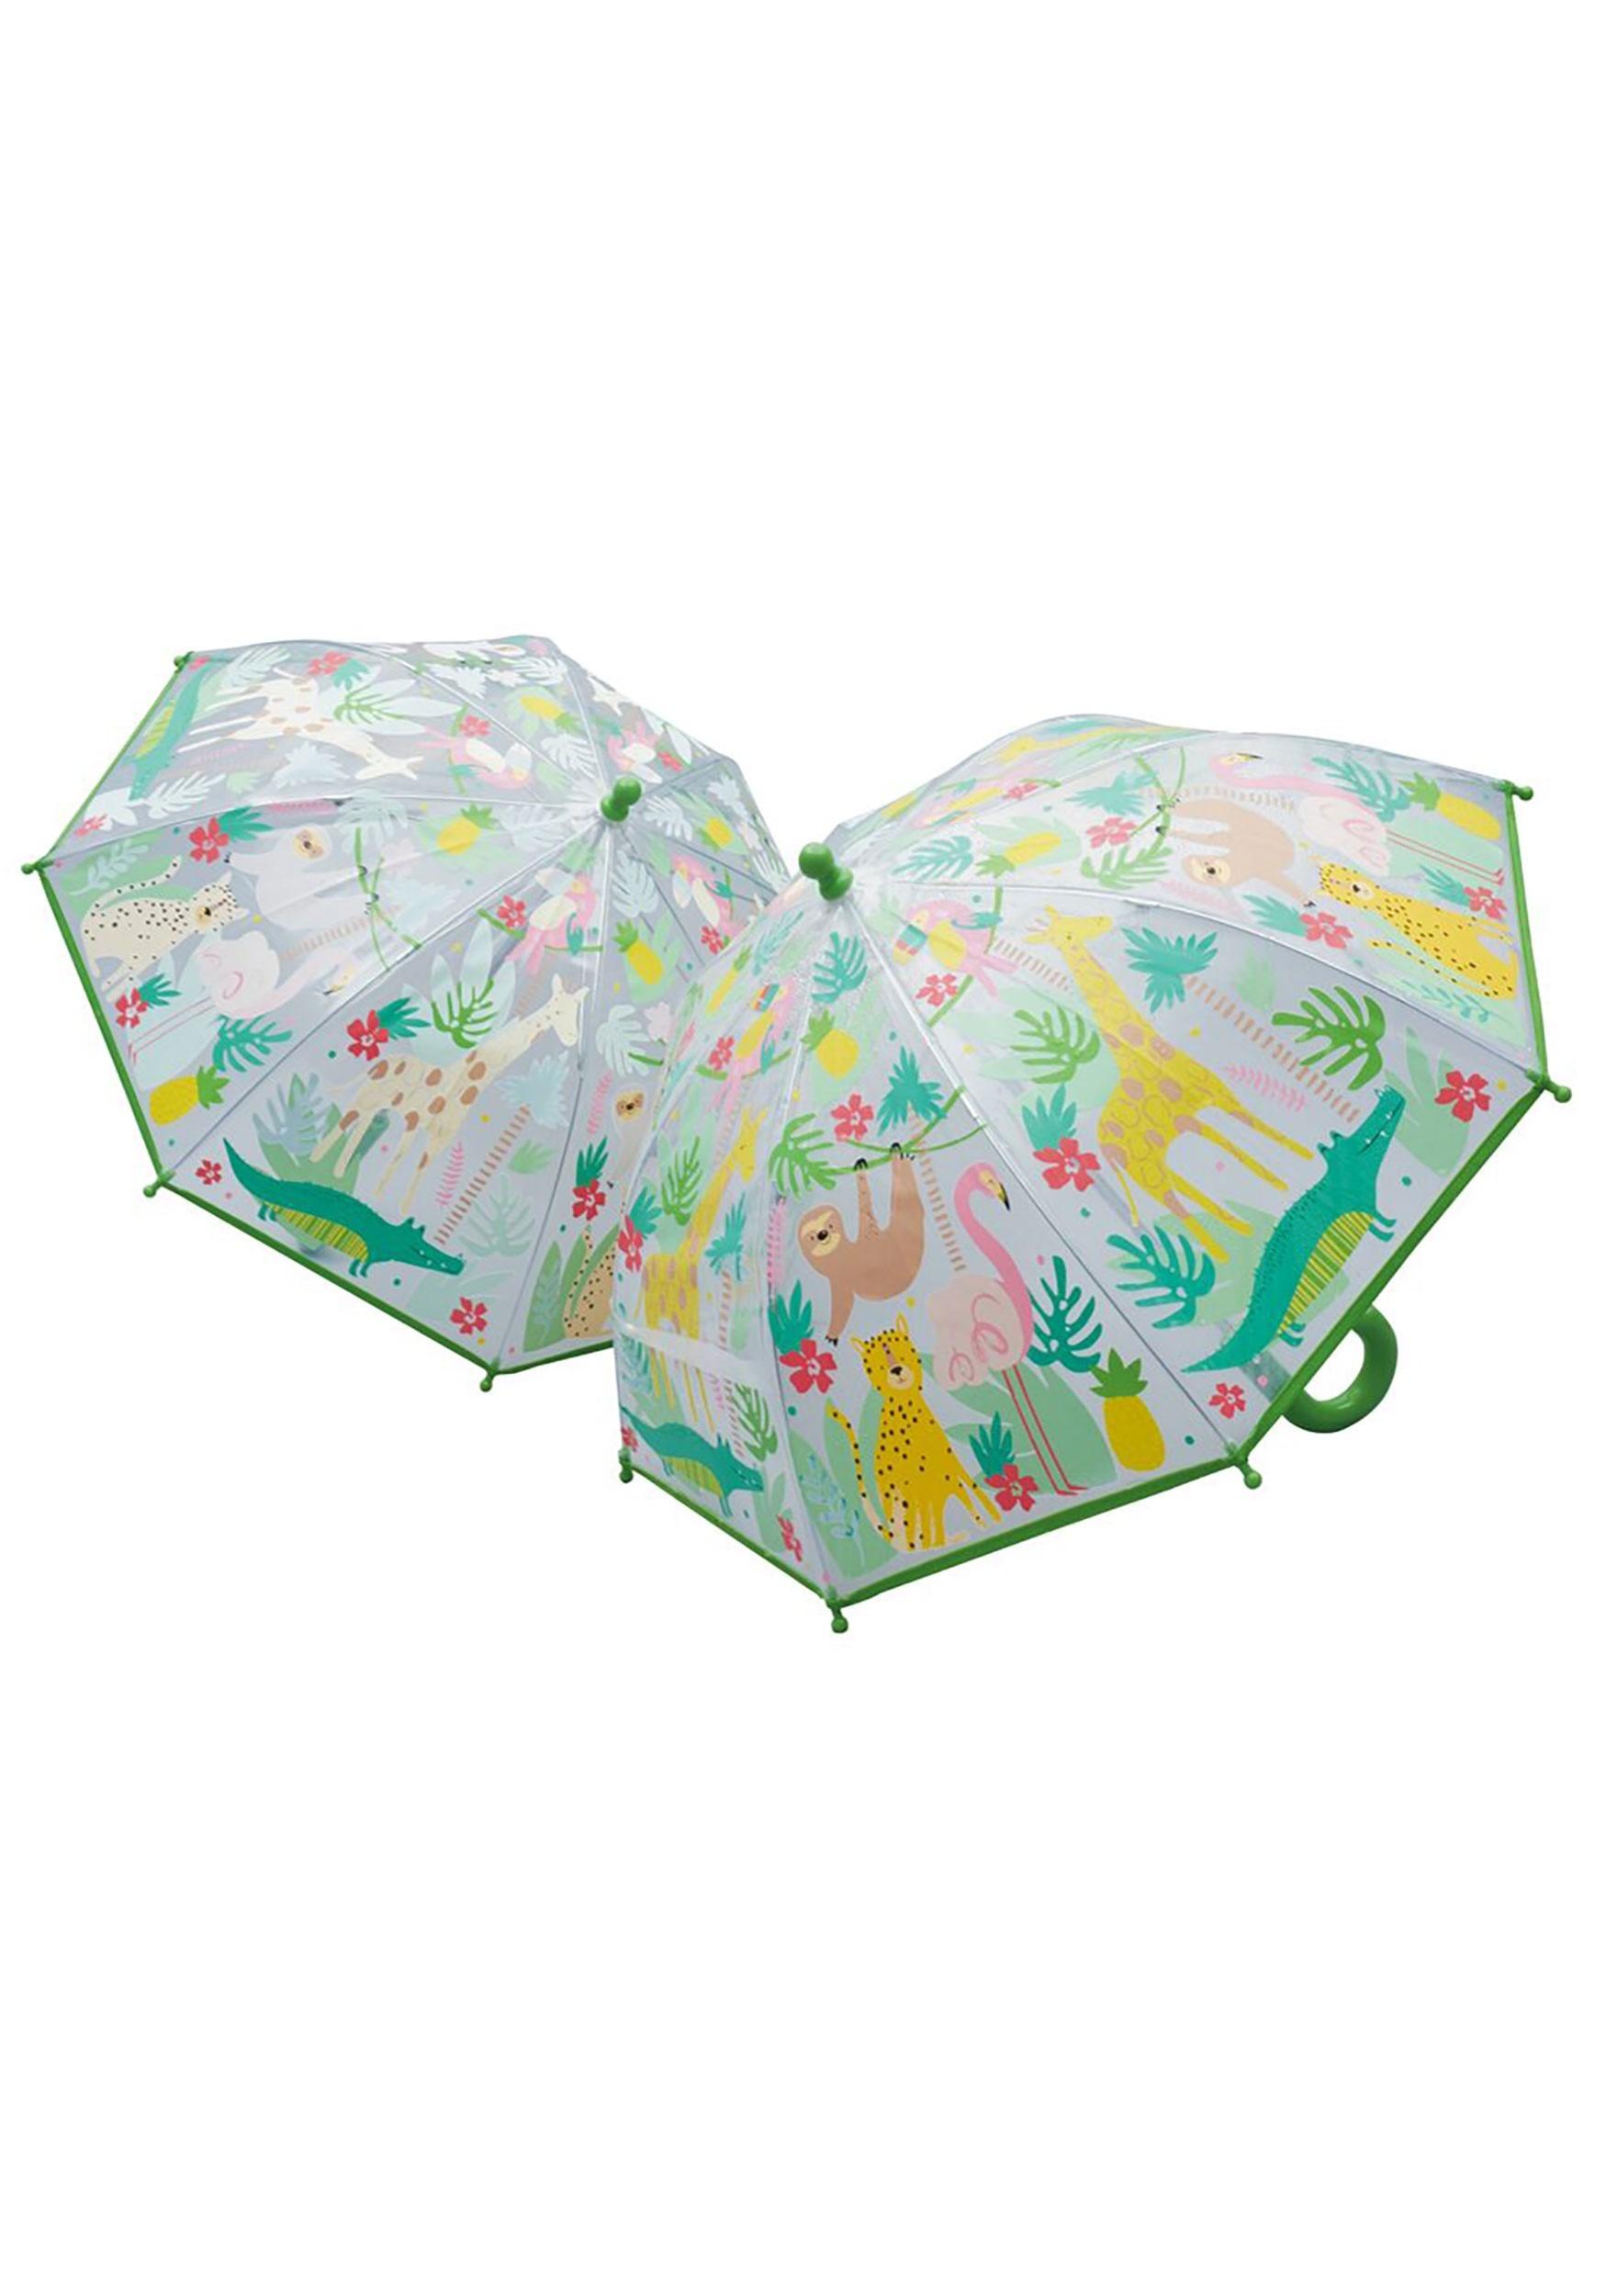 Color Changing Jungle Animals Umbrella